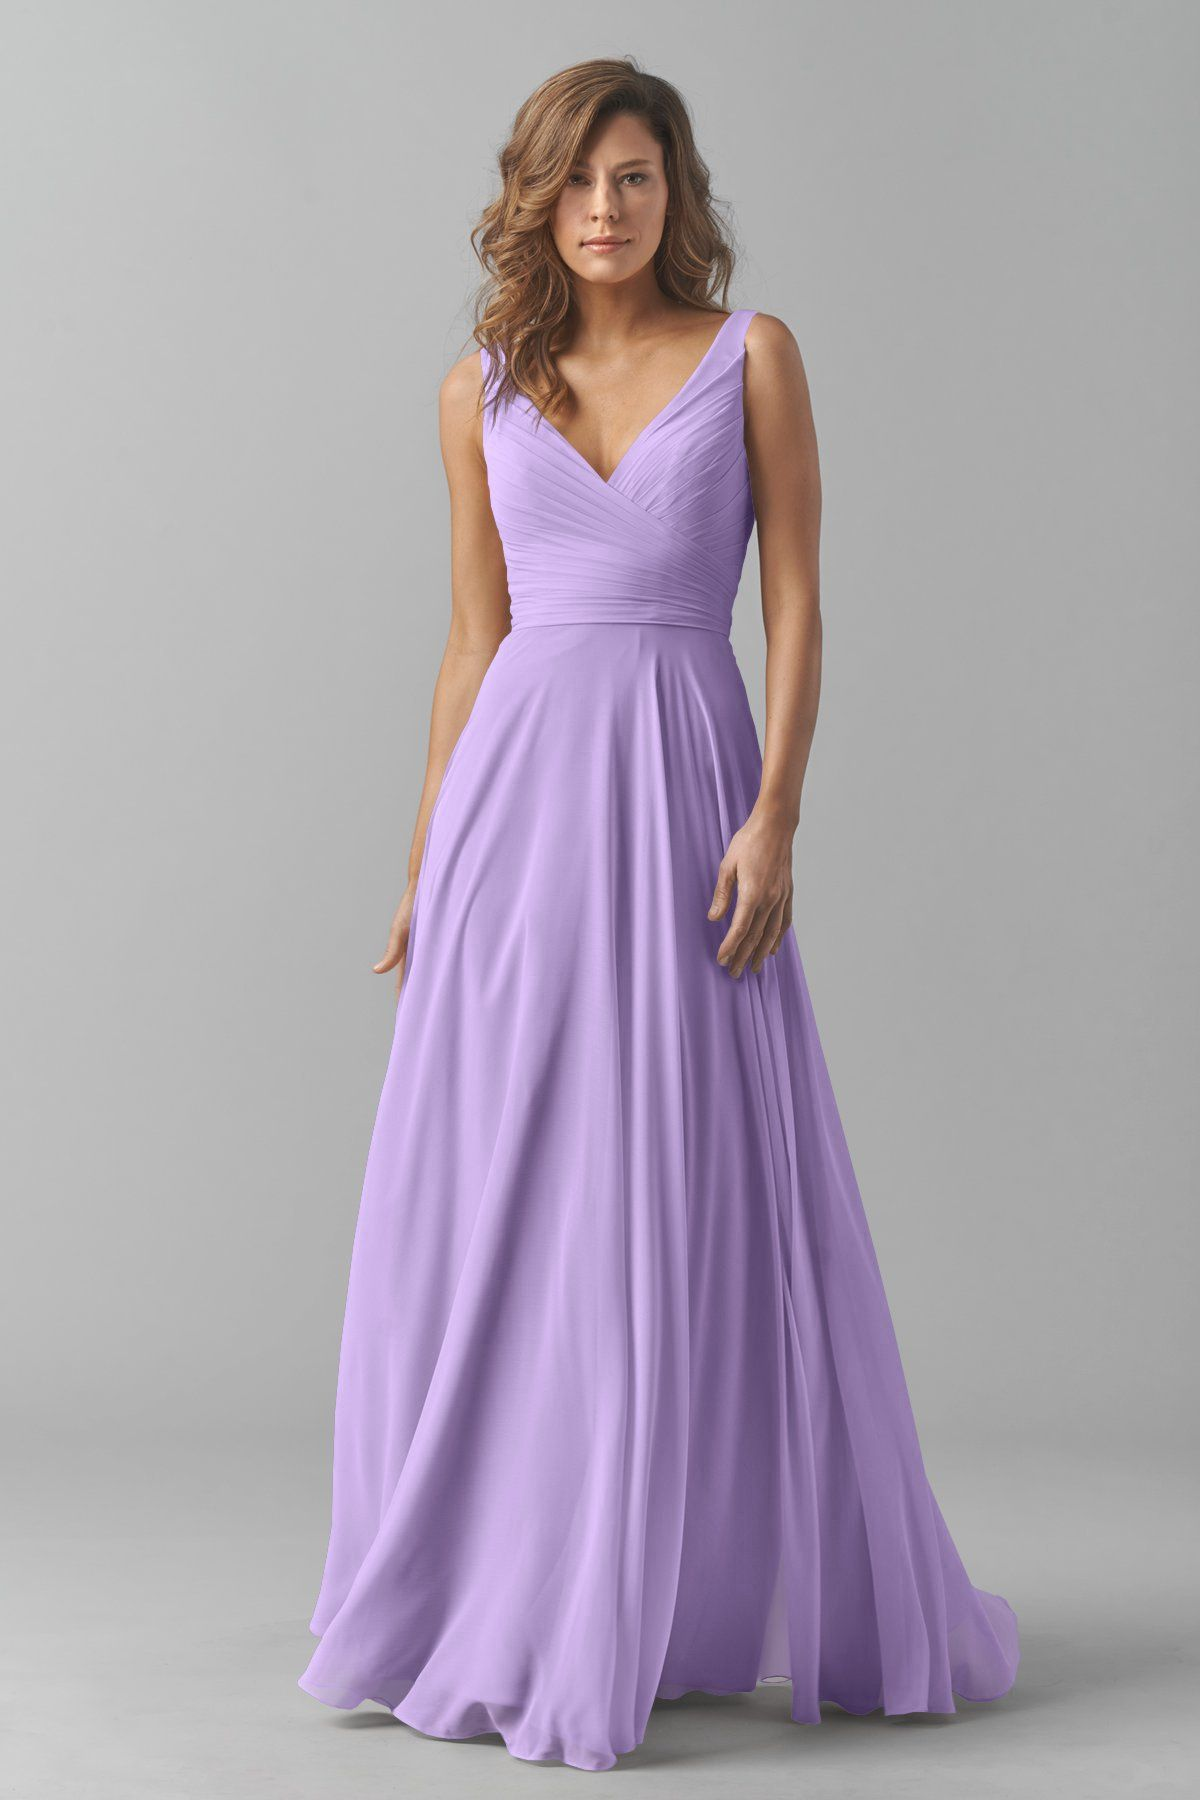 Watters Maids Dress Karen | Ashley wedding | Pinterest | Vestiditos